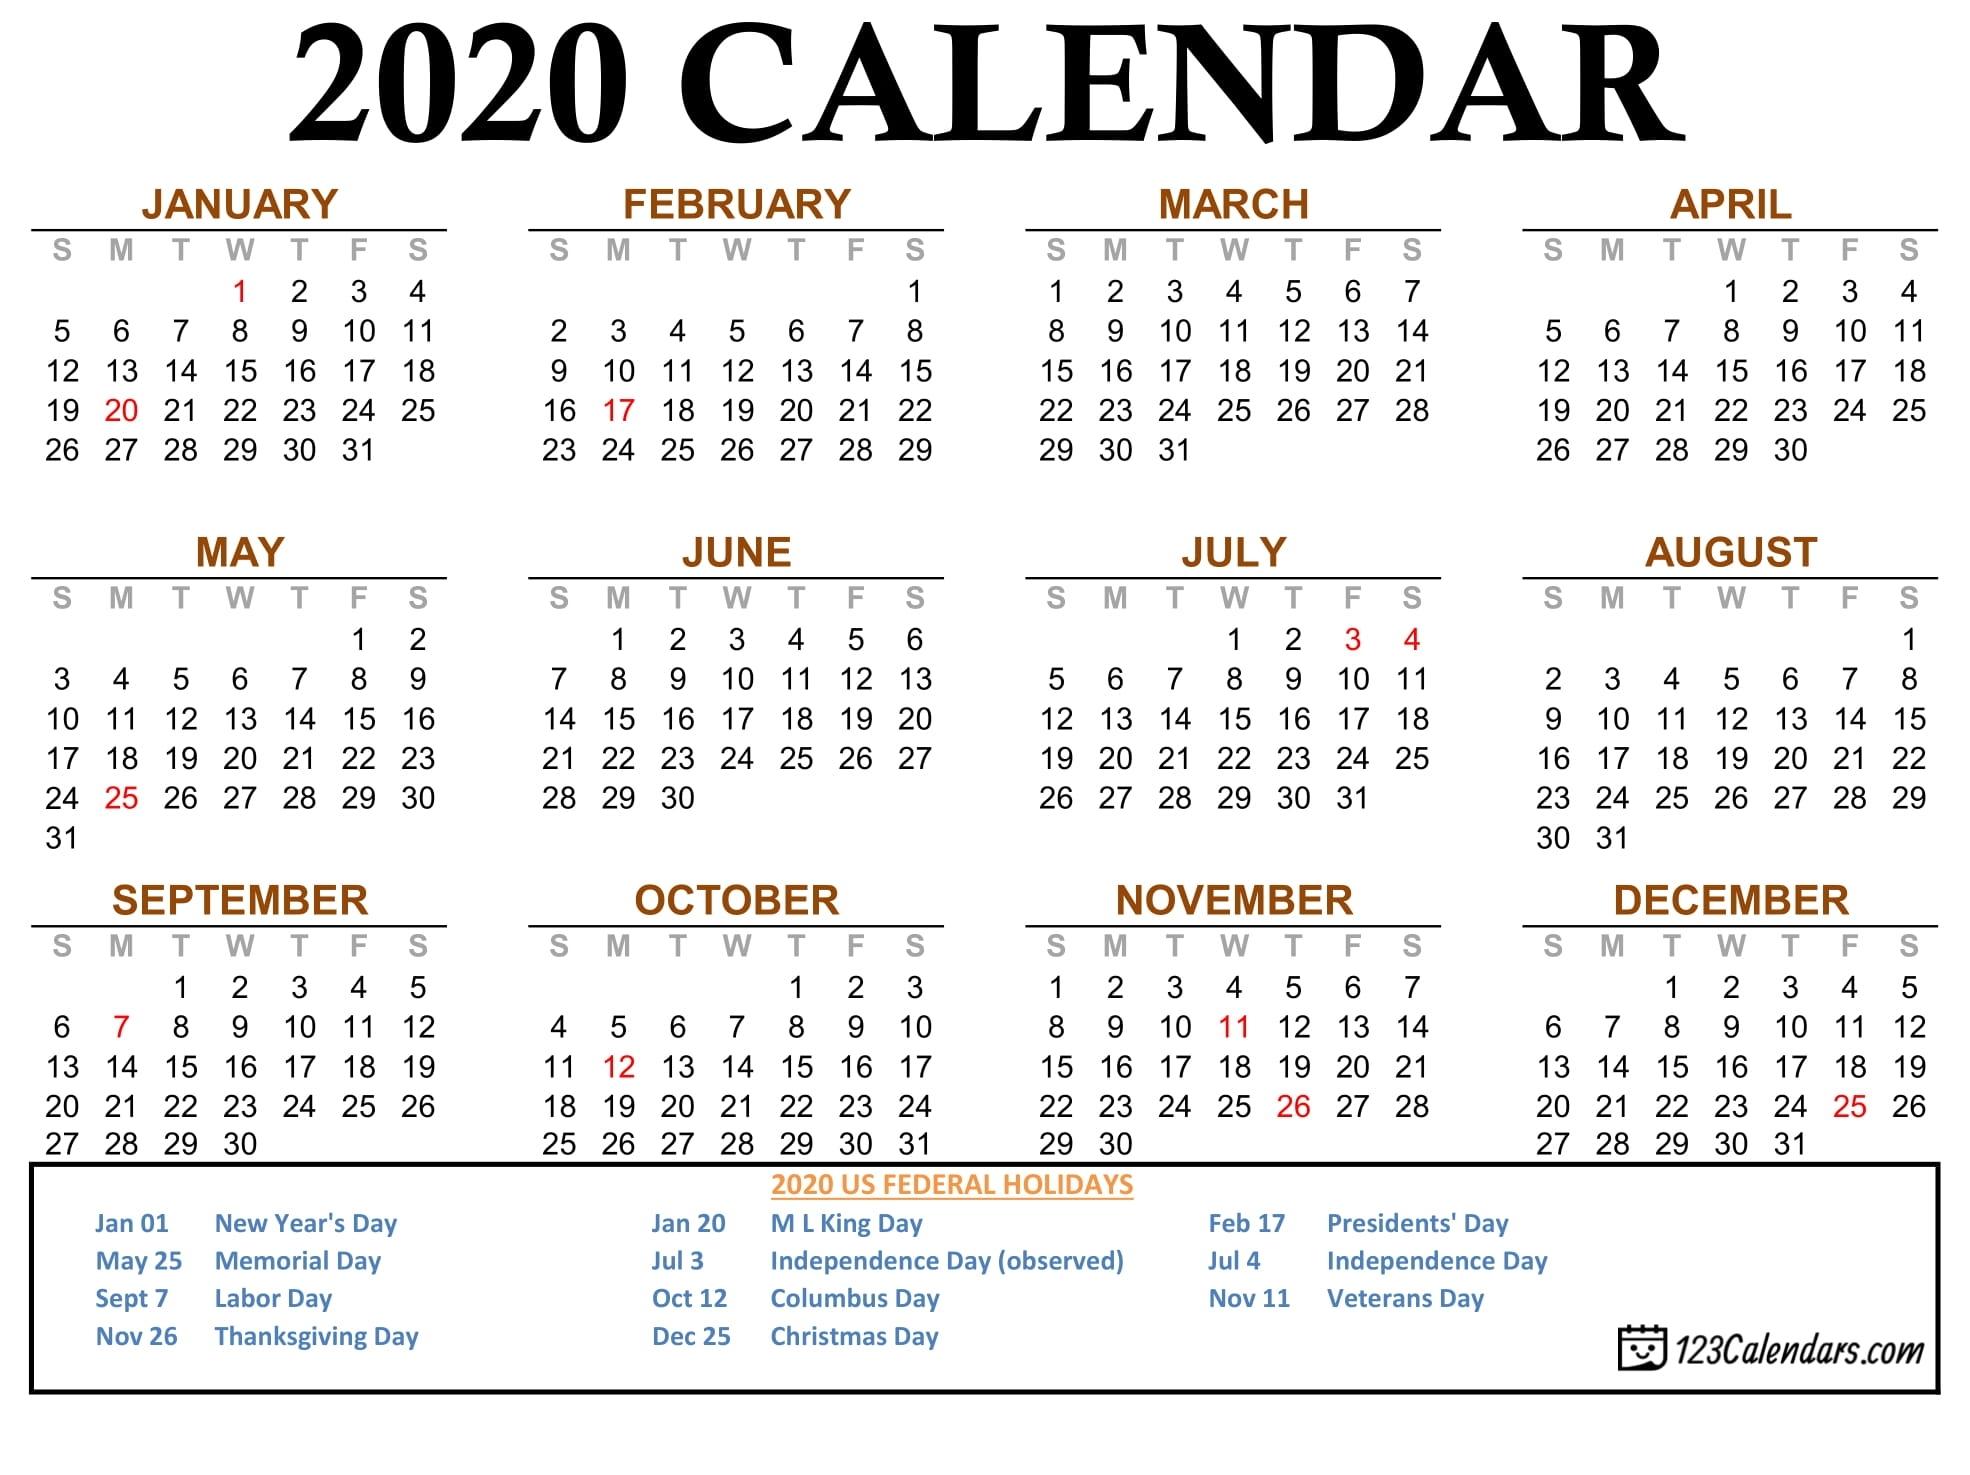 Free Printable 2020 Calendar | 123Calendars regarding Pocket Size Calendar Free Printable